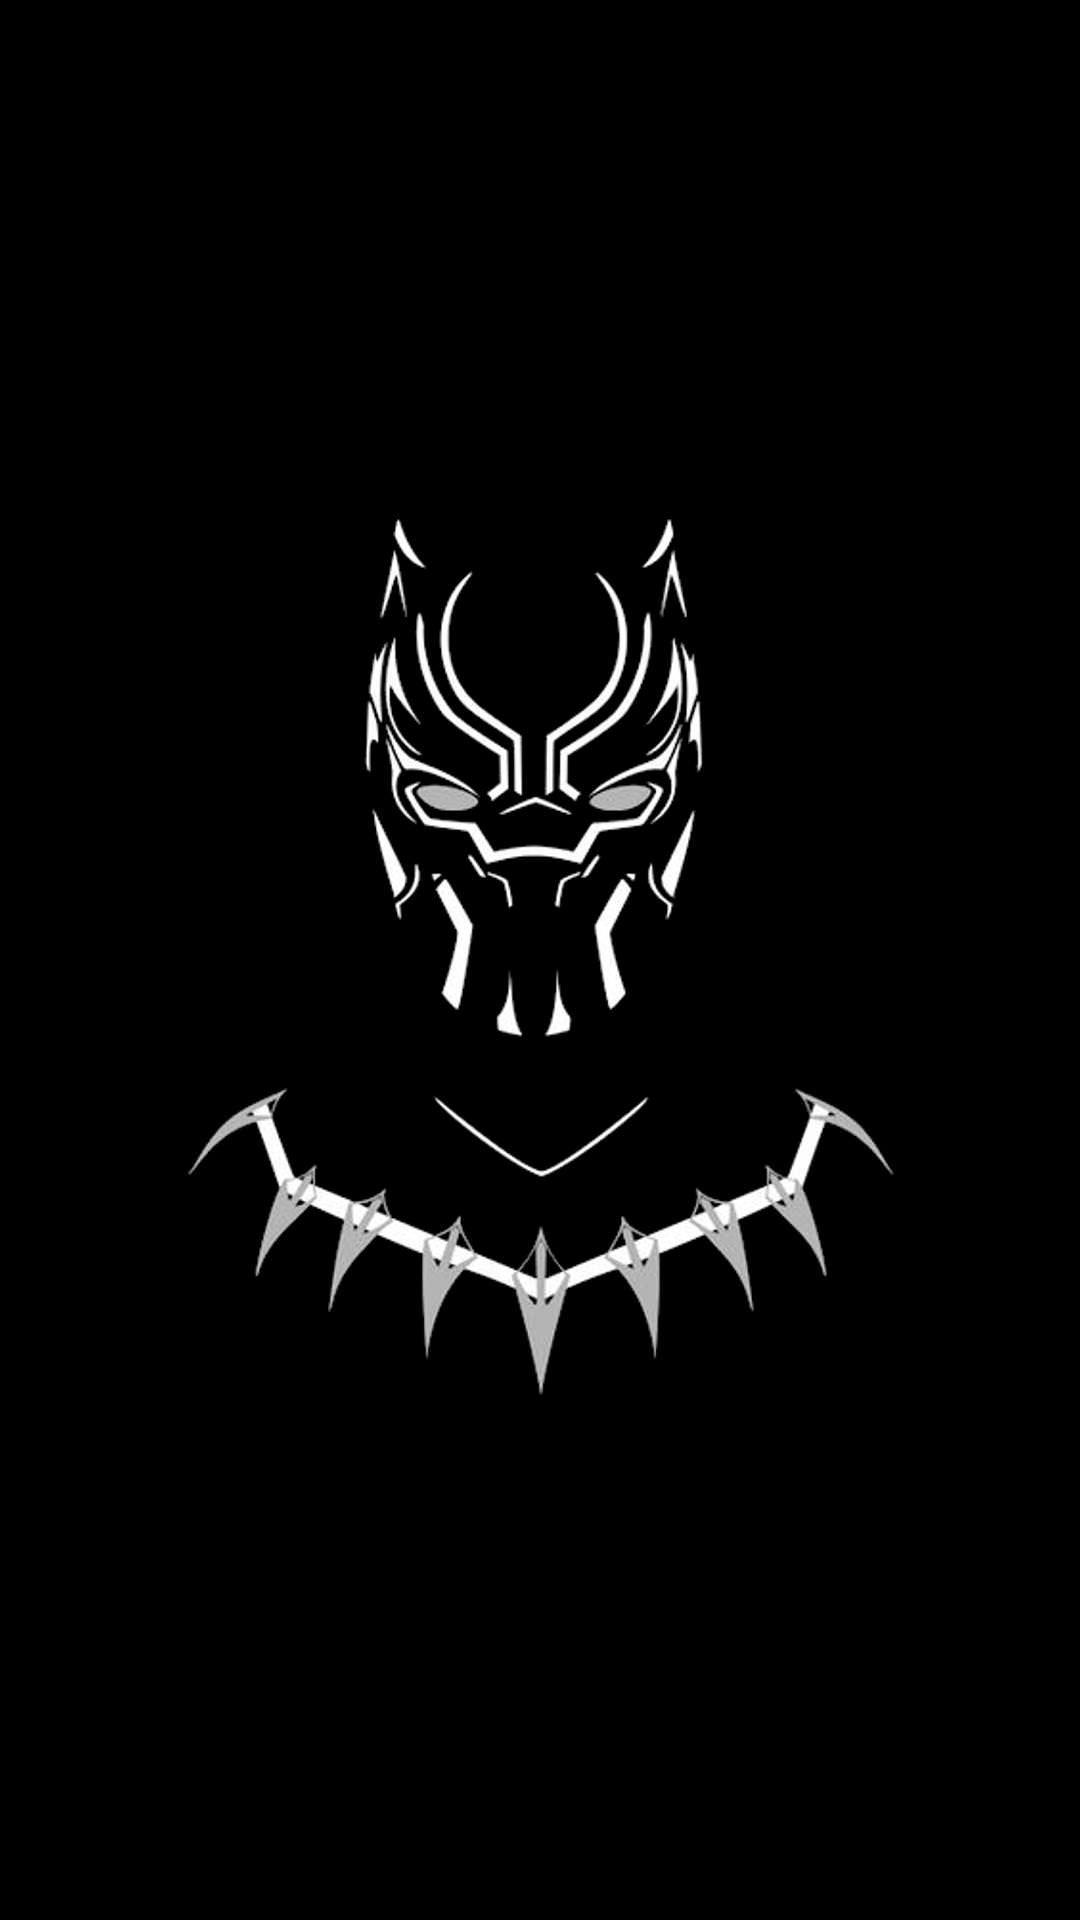 true black panther [1080x1920] (i.imgur) submittedsiriacus